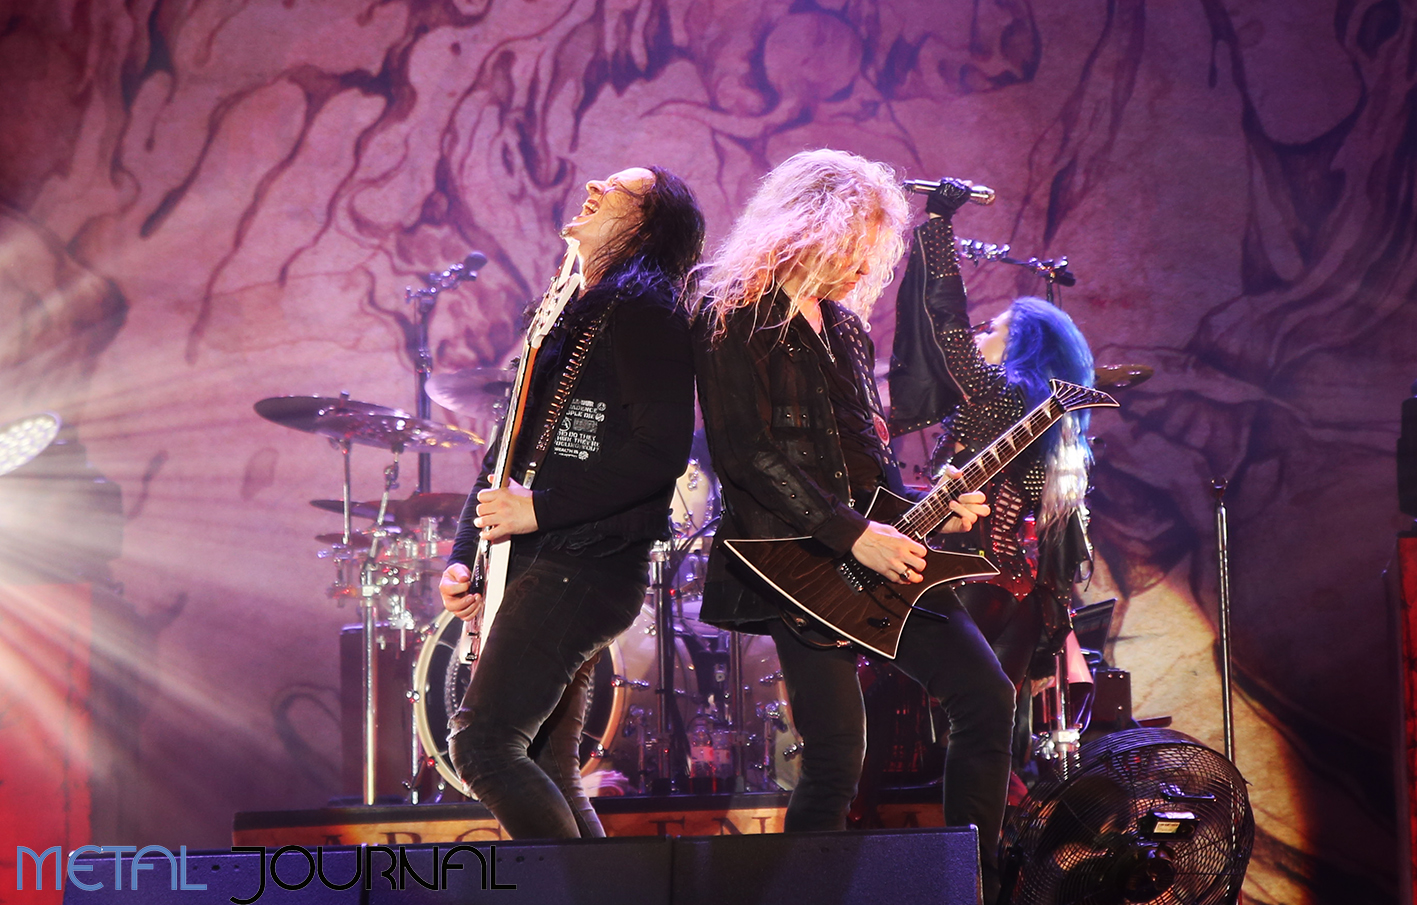 arch enemy - metal journal rock fest barcelona 2019 pic 6